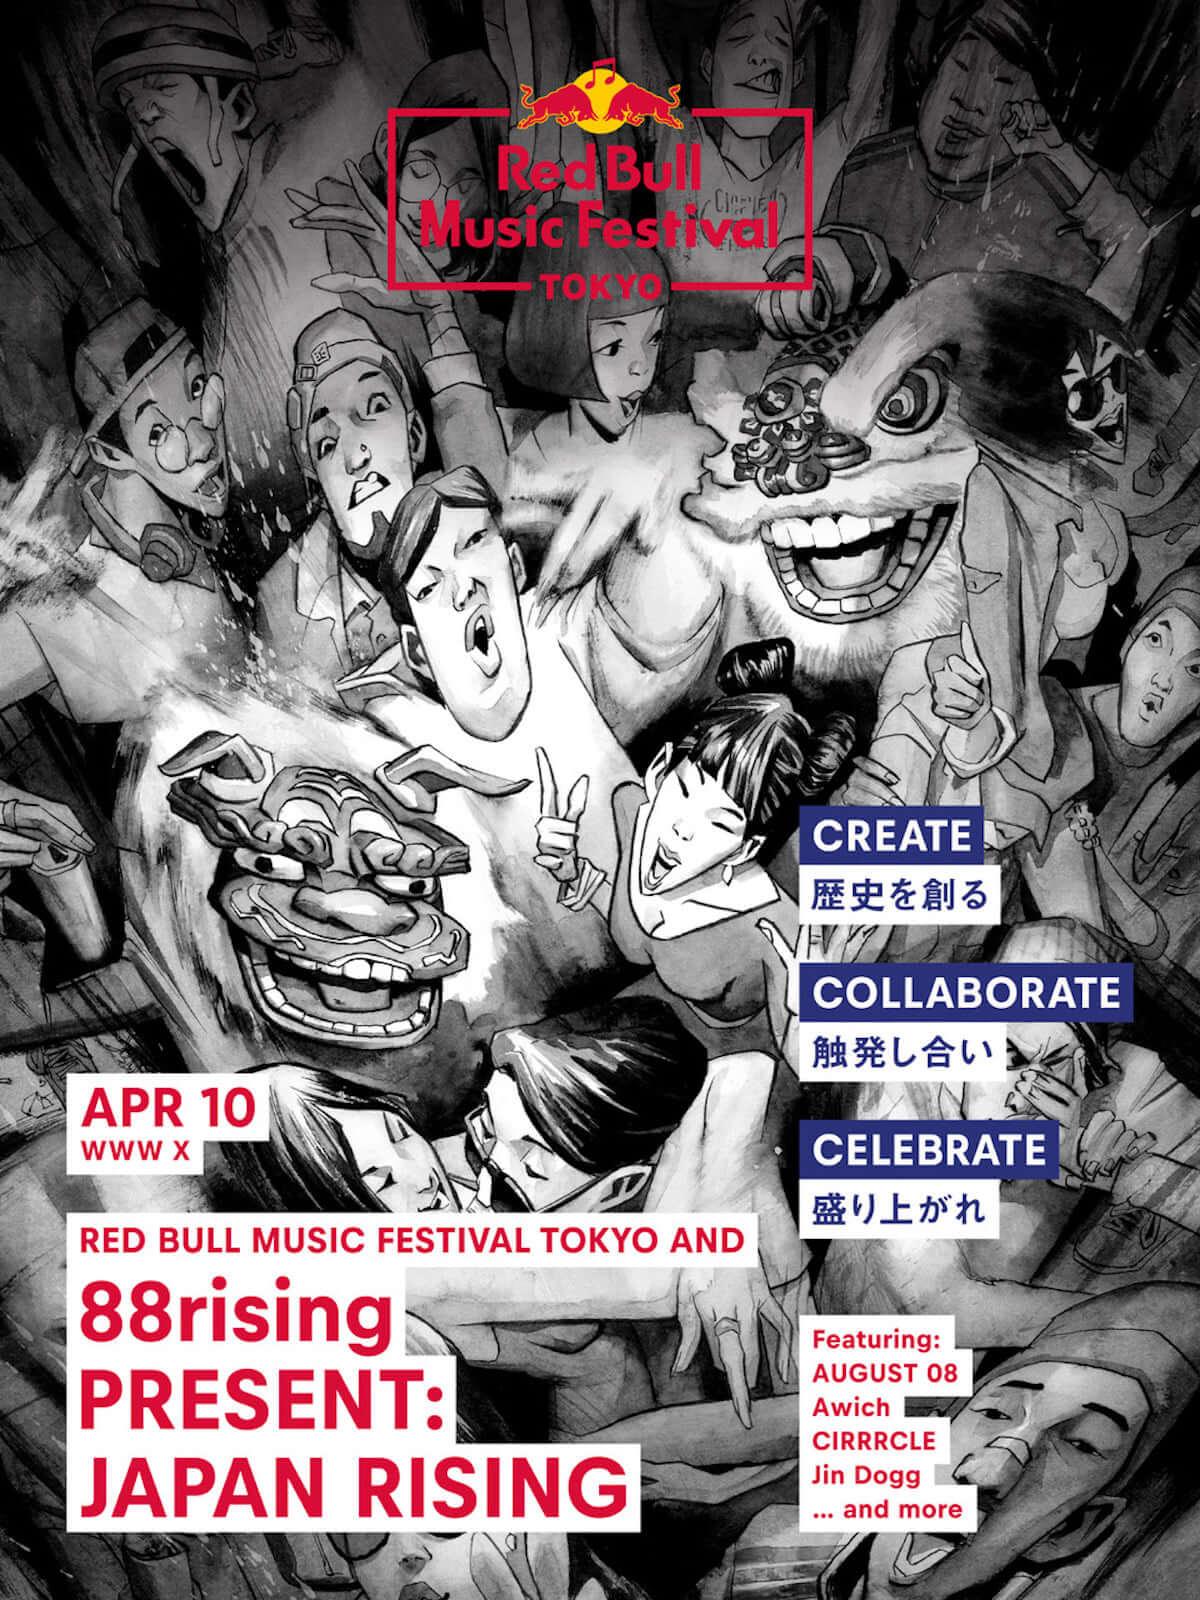 88risingとRed Bull Music Festivalの豪華イベントが本日開催|Awich、CIRRRCLEら共演 music190410_88rising_1-1200x1600